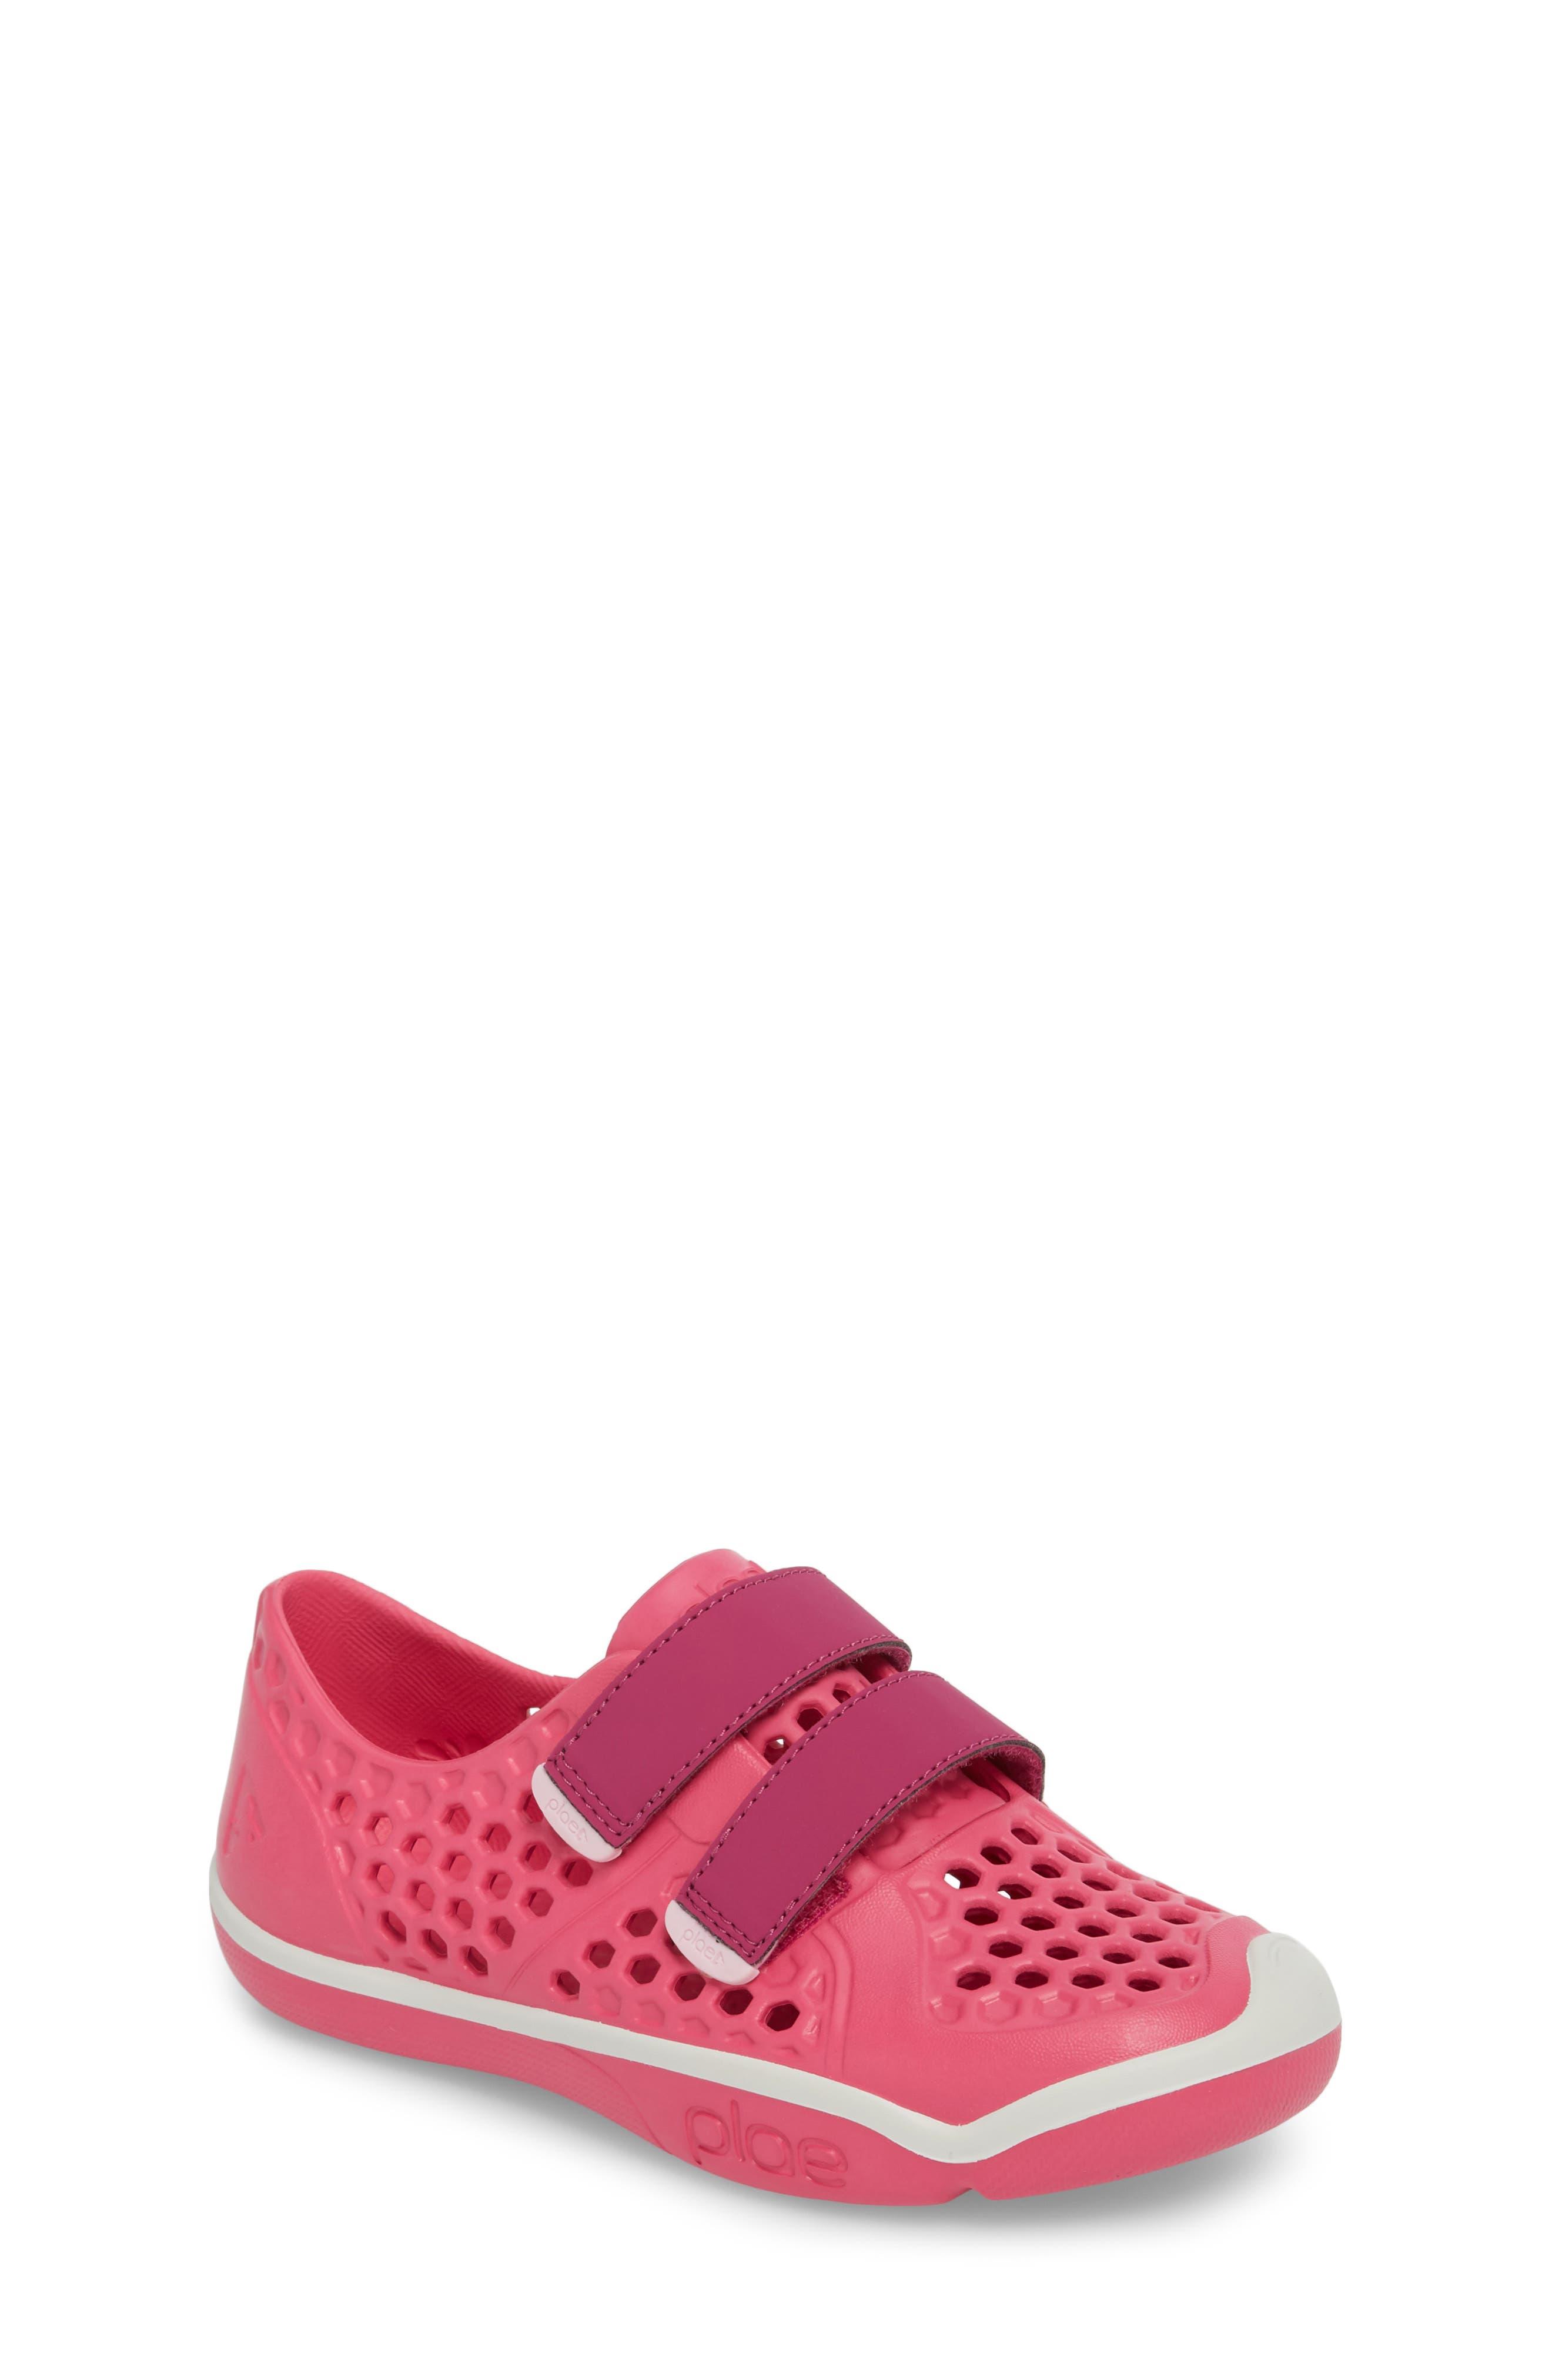 49bfac68479c Kids  PLAE Shoes